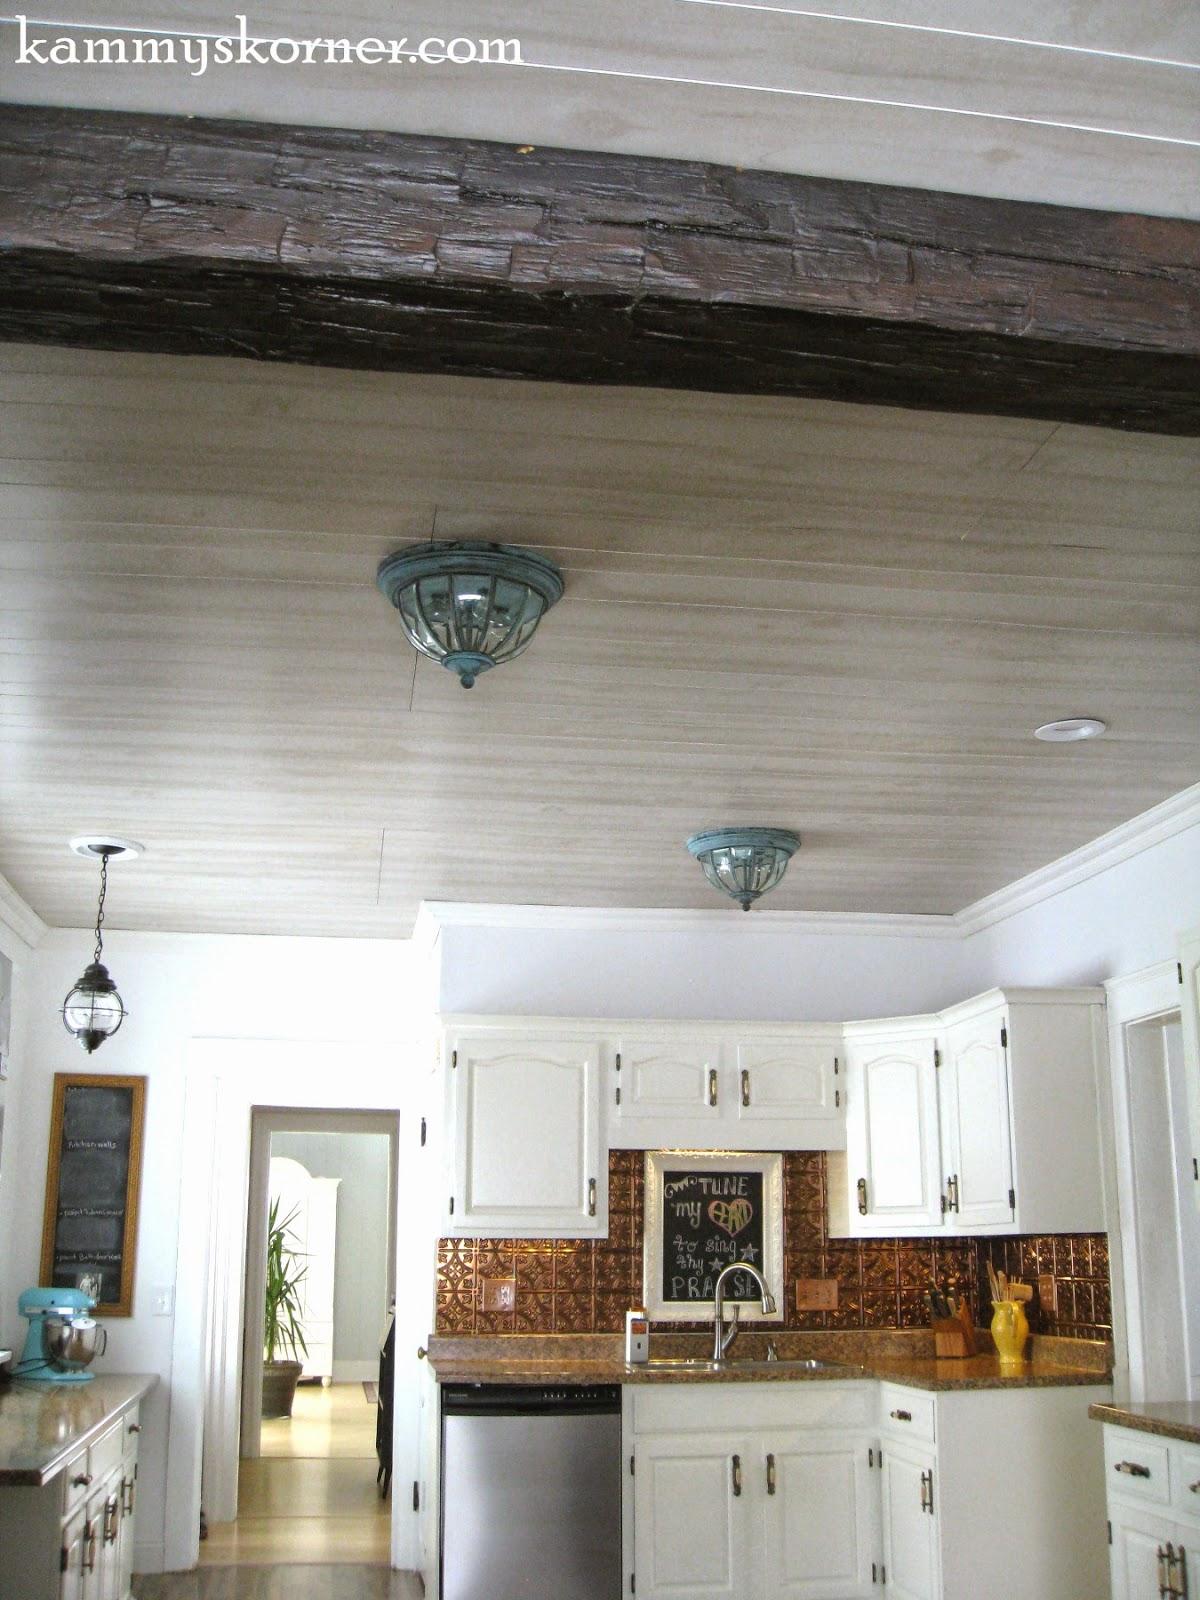 Kammy S Korner Whitewash Paneled Kitchen Ceiling